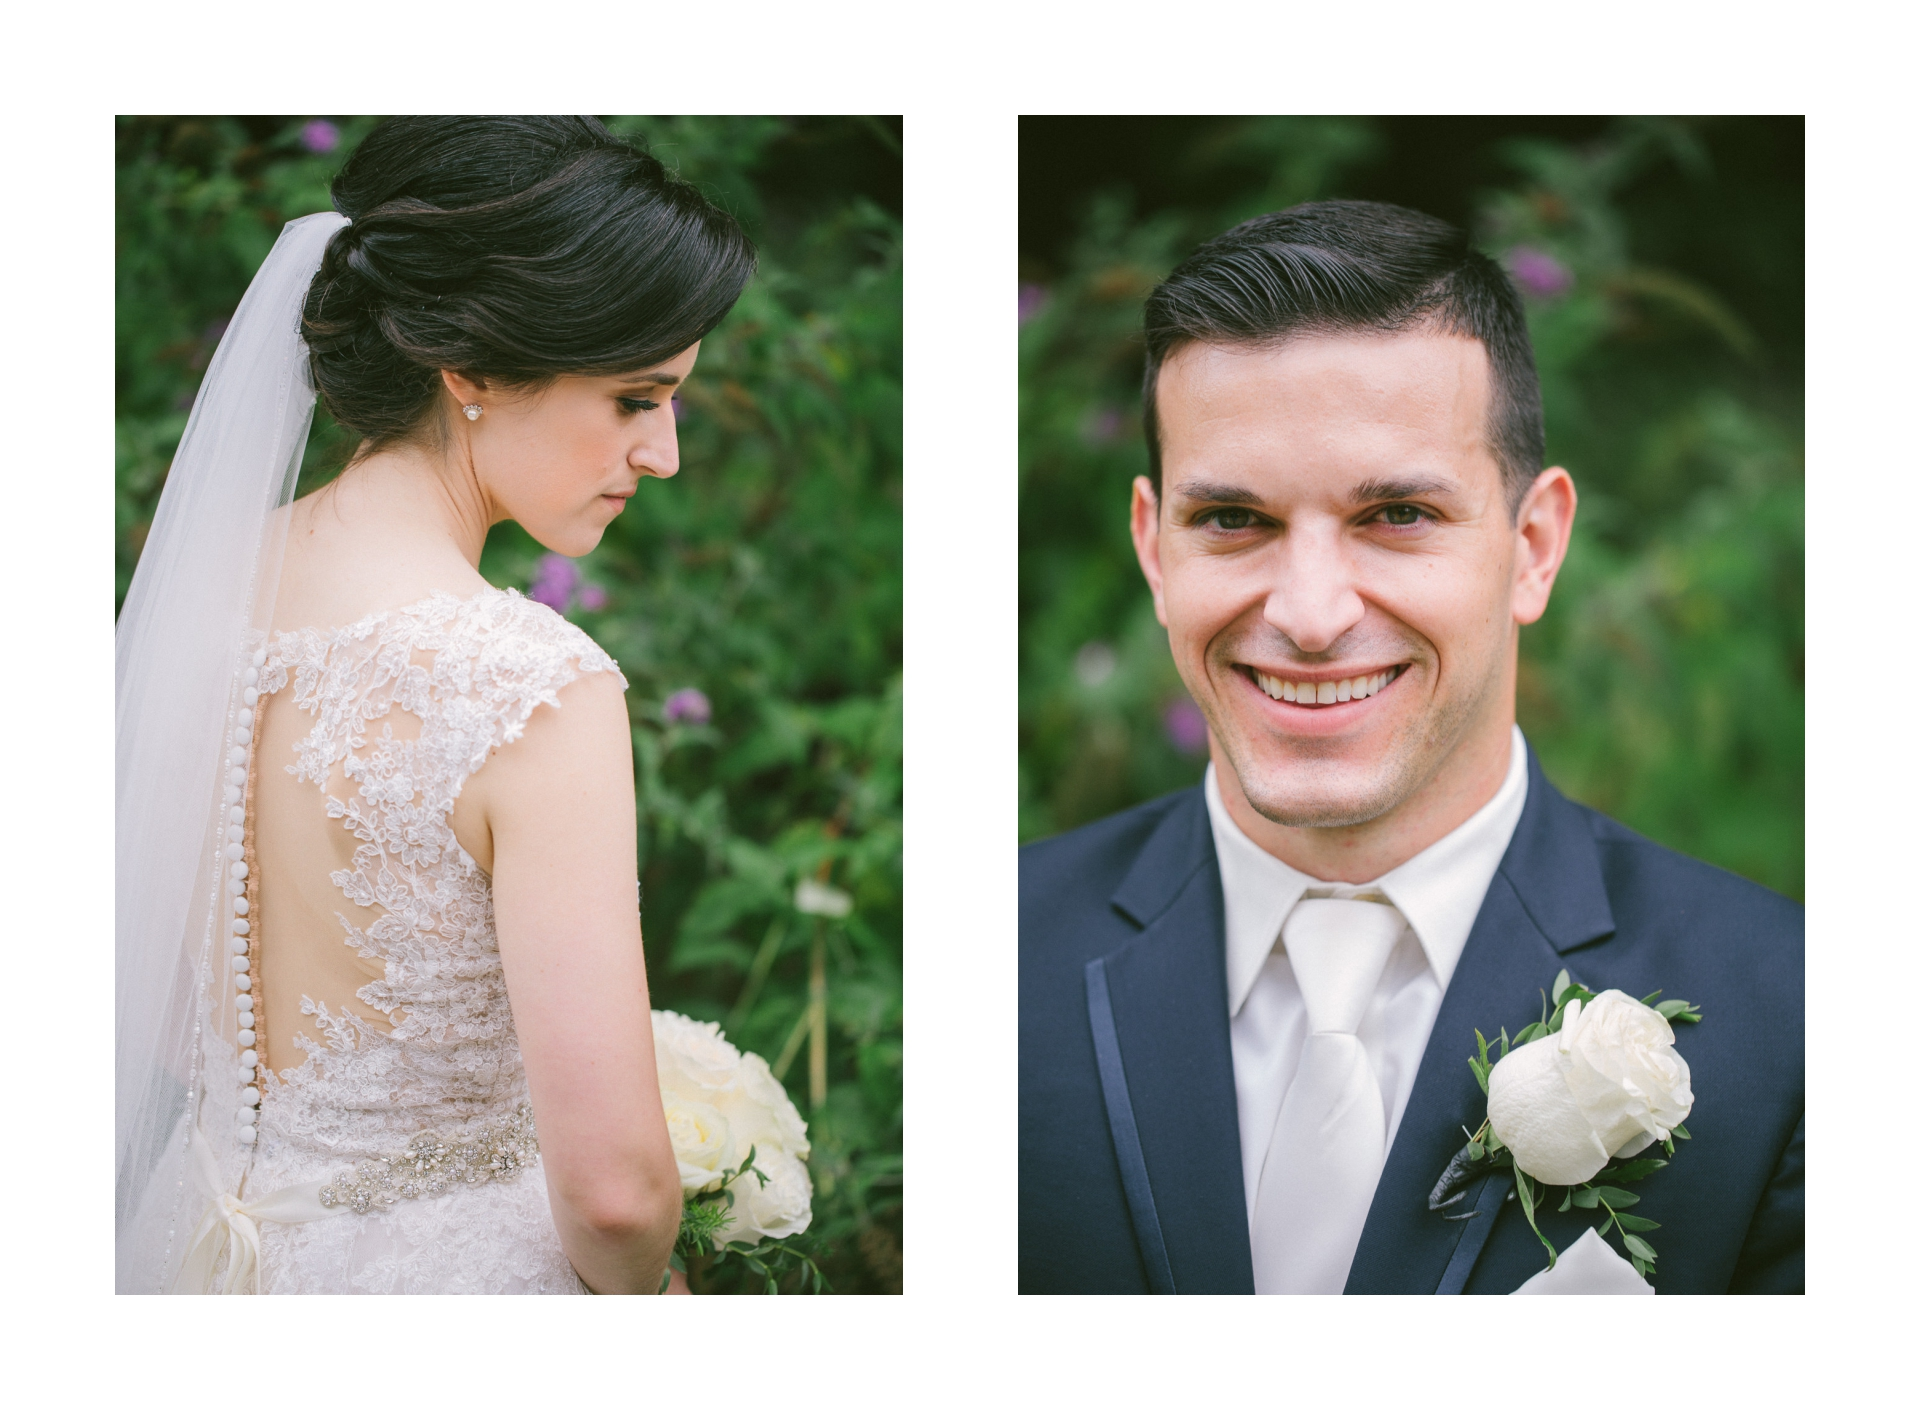 Intercontinental Hotel Wedding in Cleveland 2 6.jpg